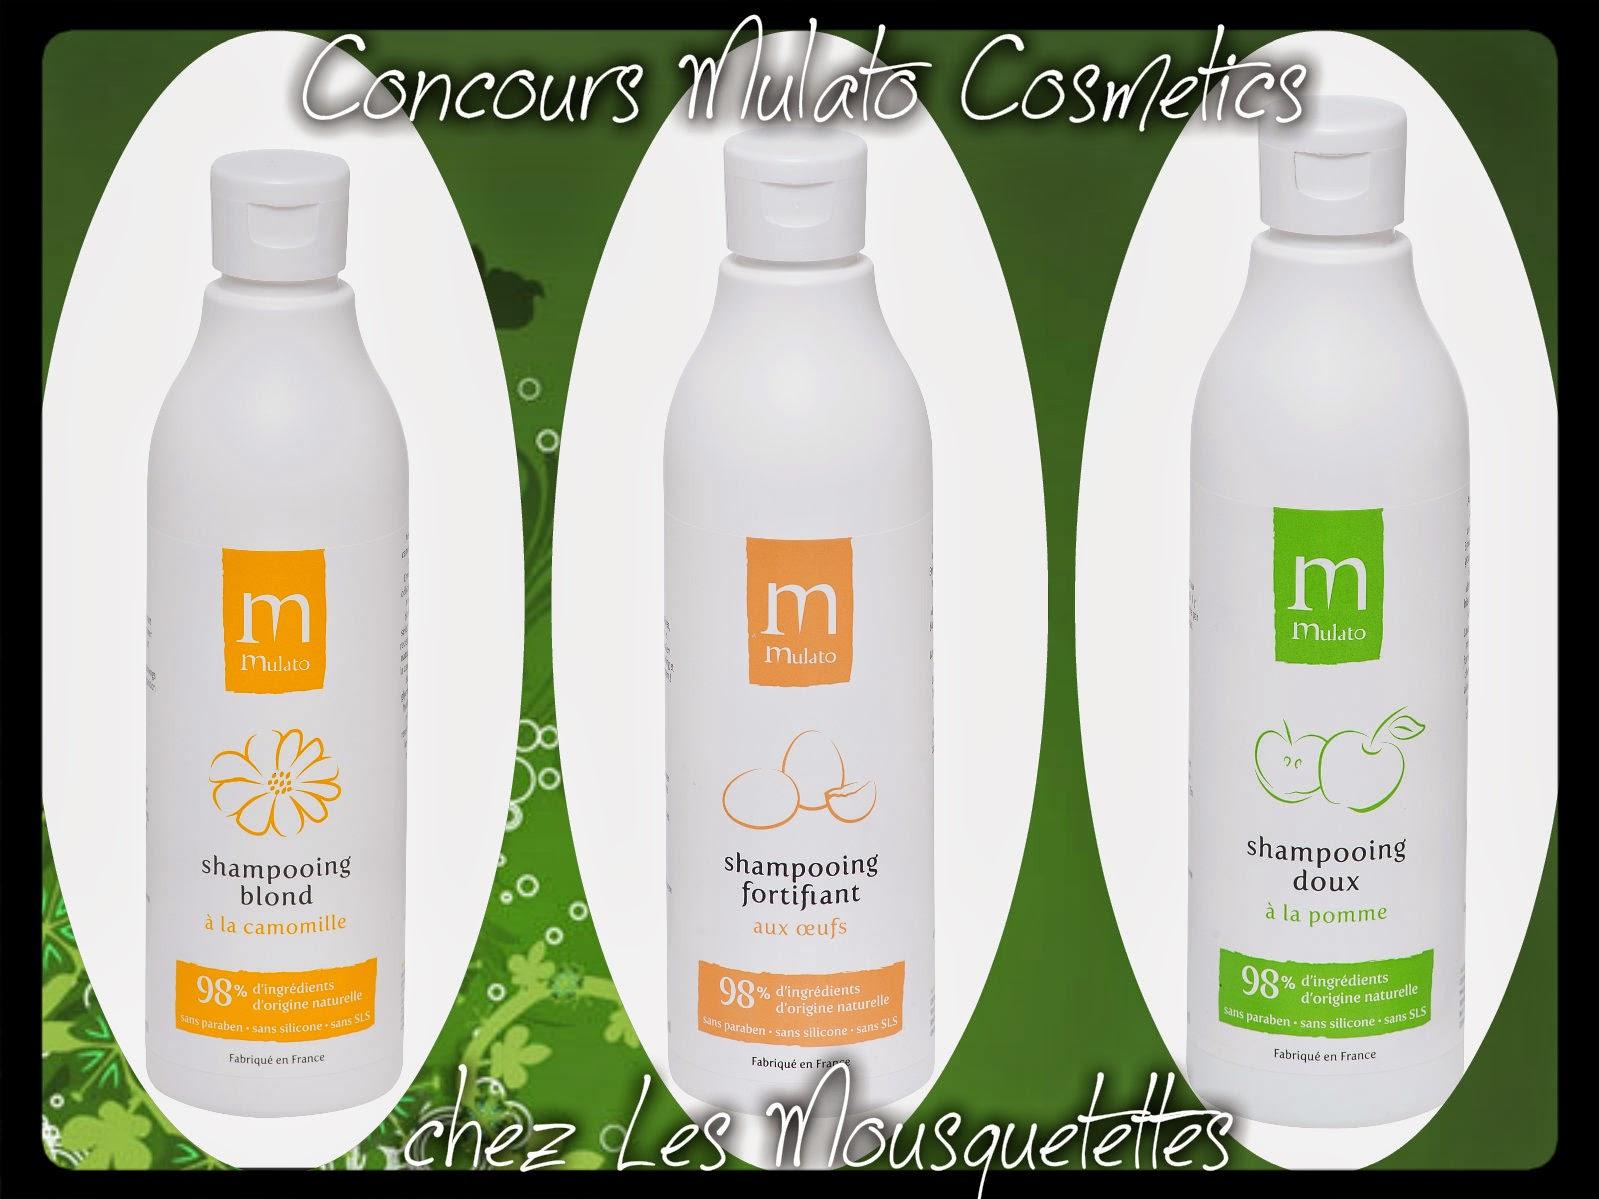 #concours Mulato Cosmetics - Les Mousquetettes©